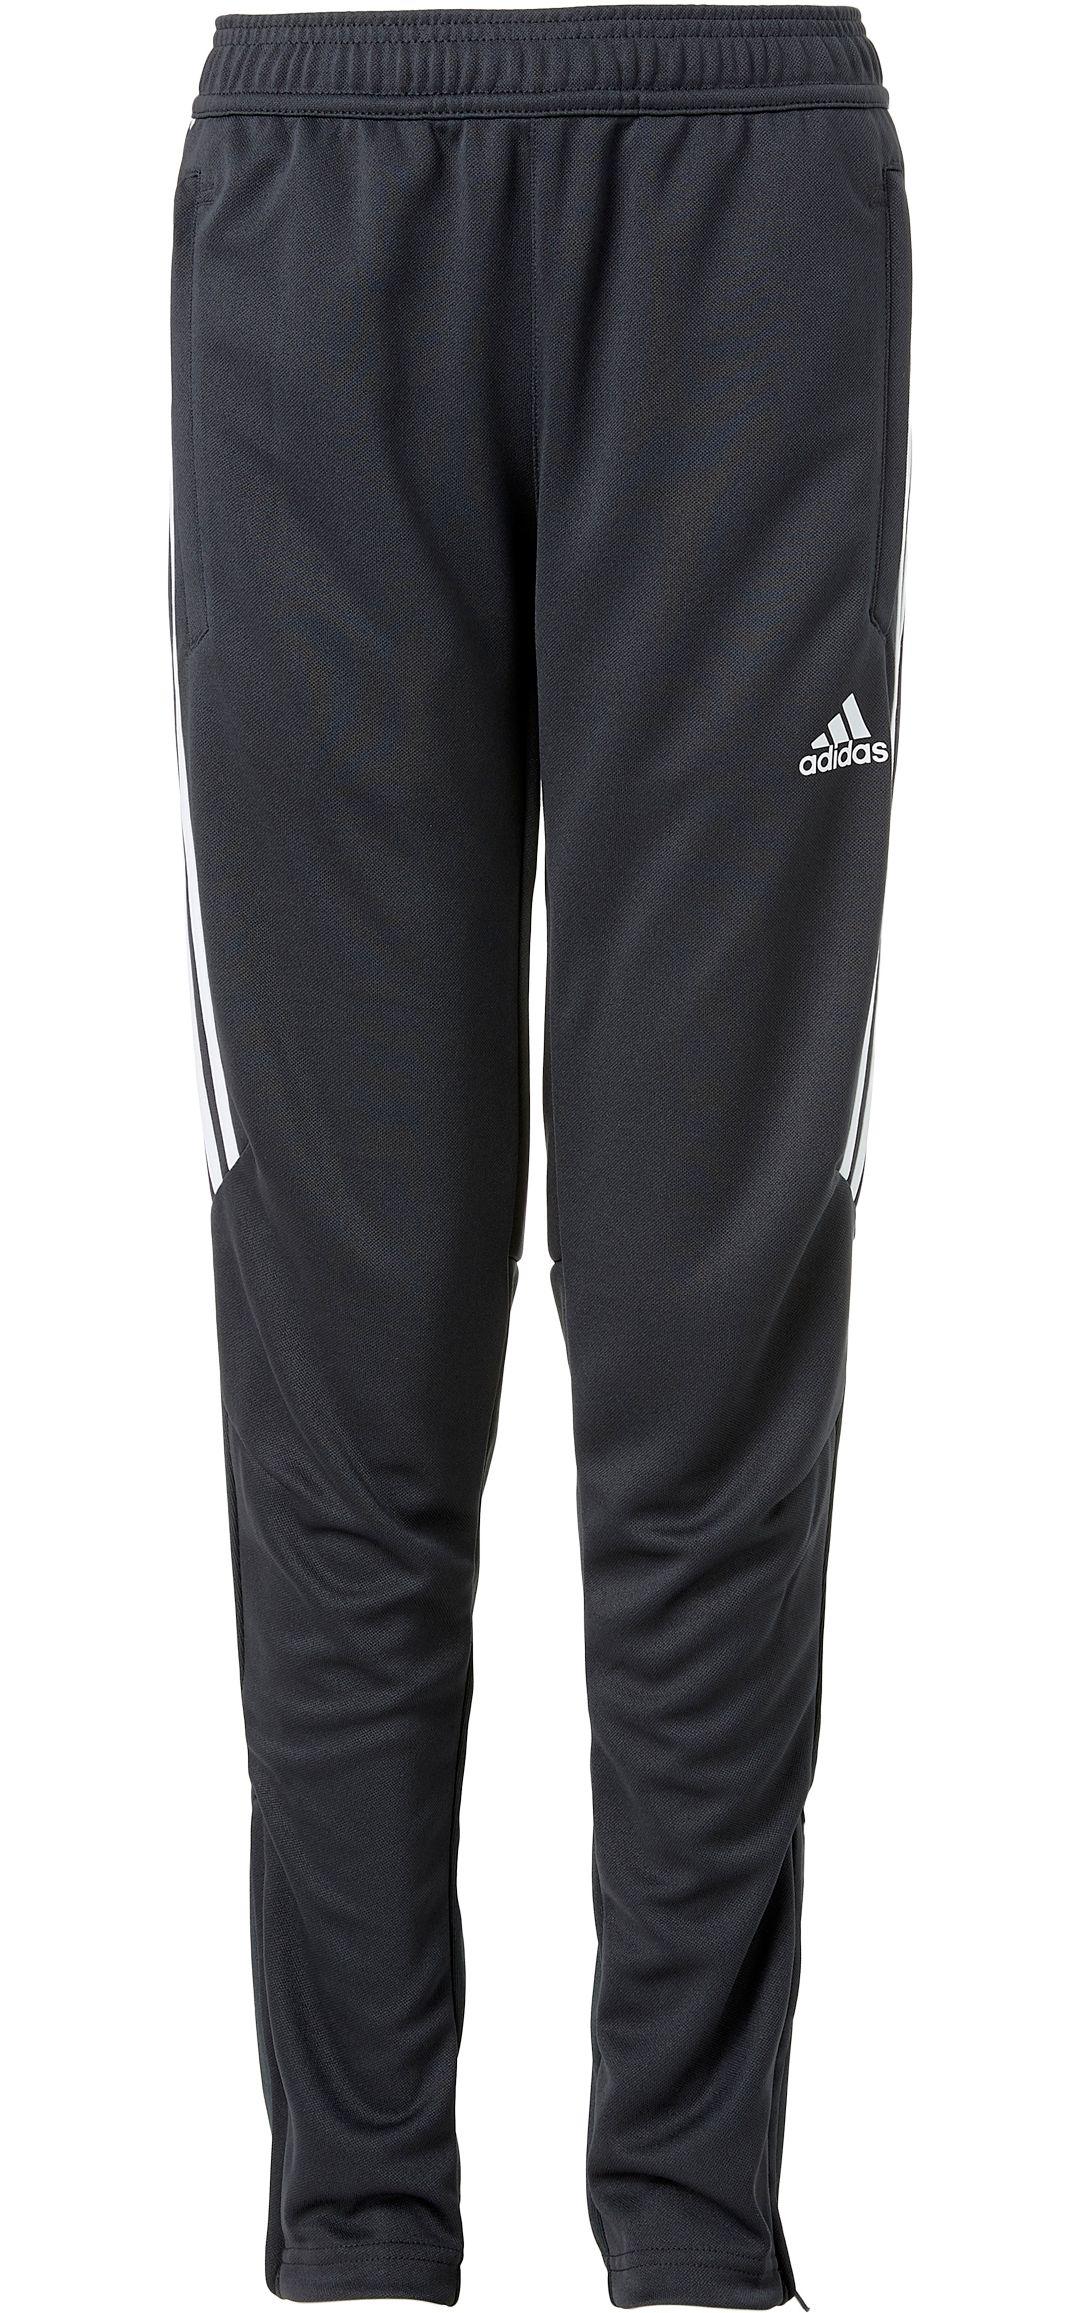 2c1070d60 adidas Youth Tiro 17 Soccer Training Pants | DICK'S Sporting Goods